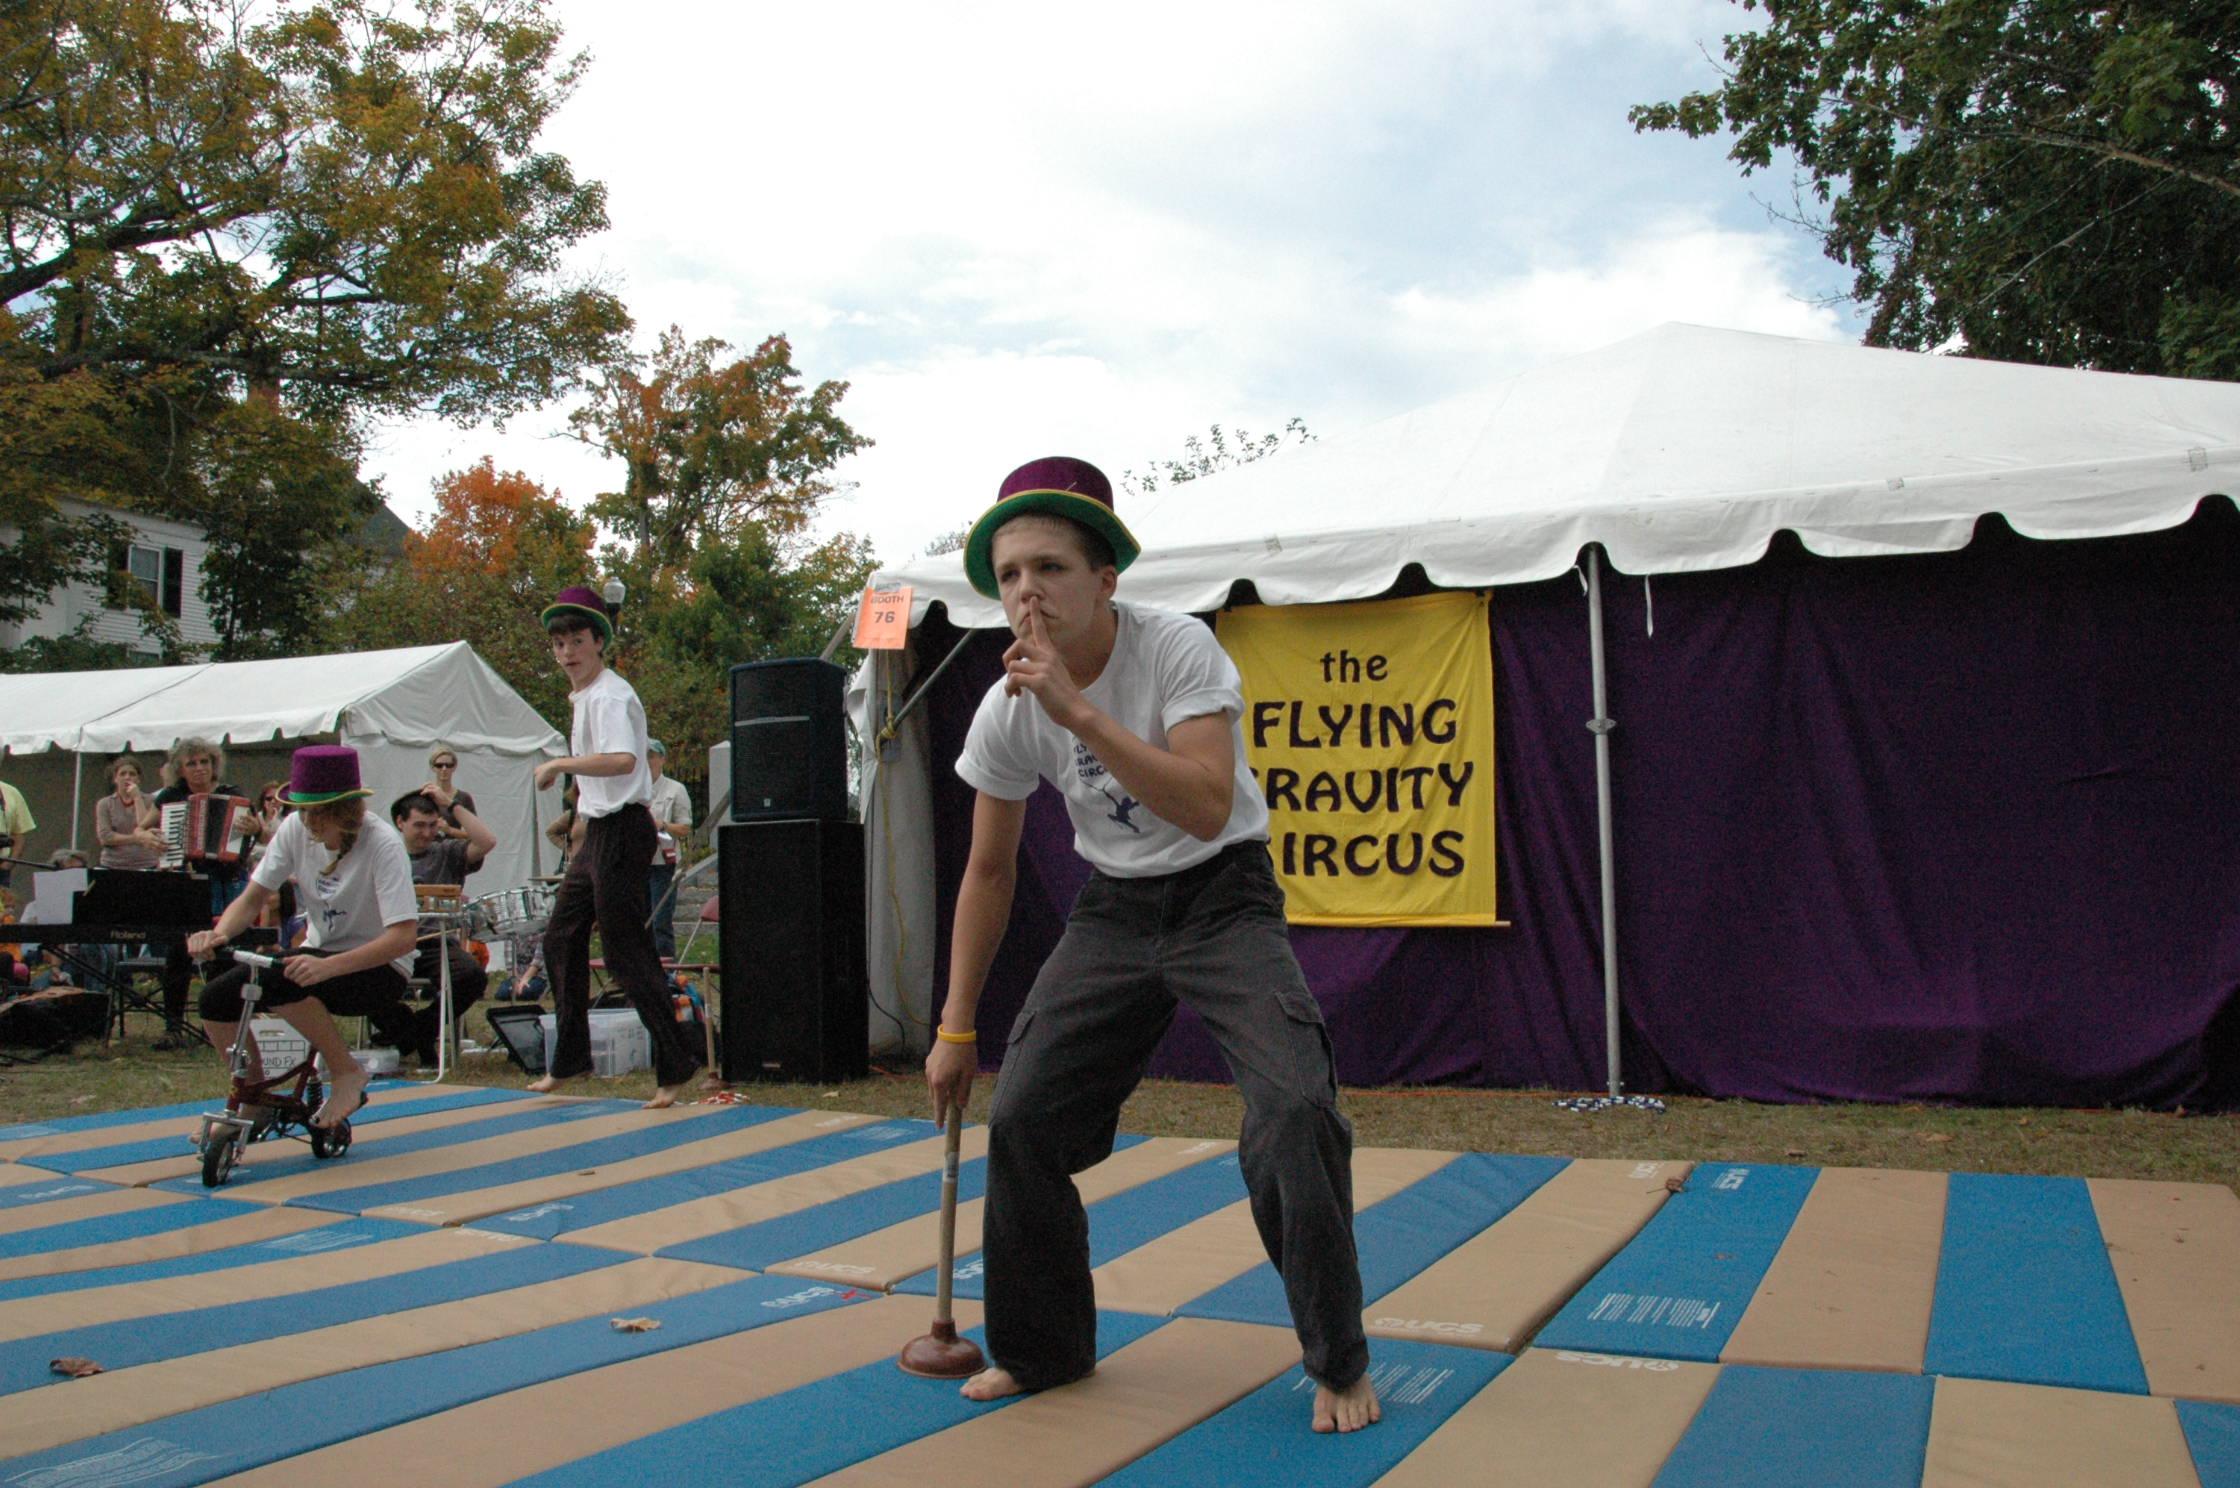 2012-10-06 Flyin Gravity Circus - Pumpkin 100.JPG